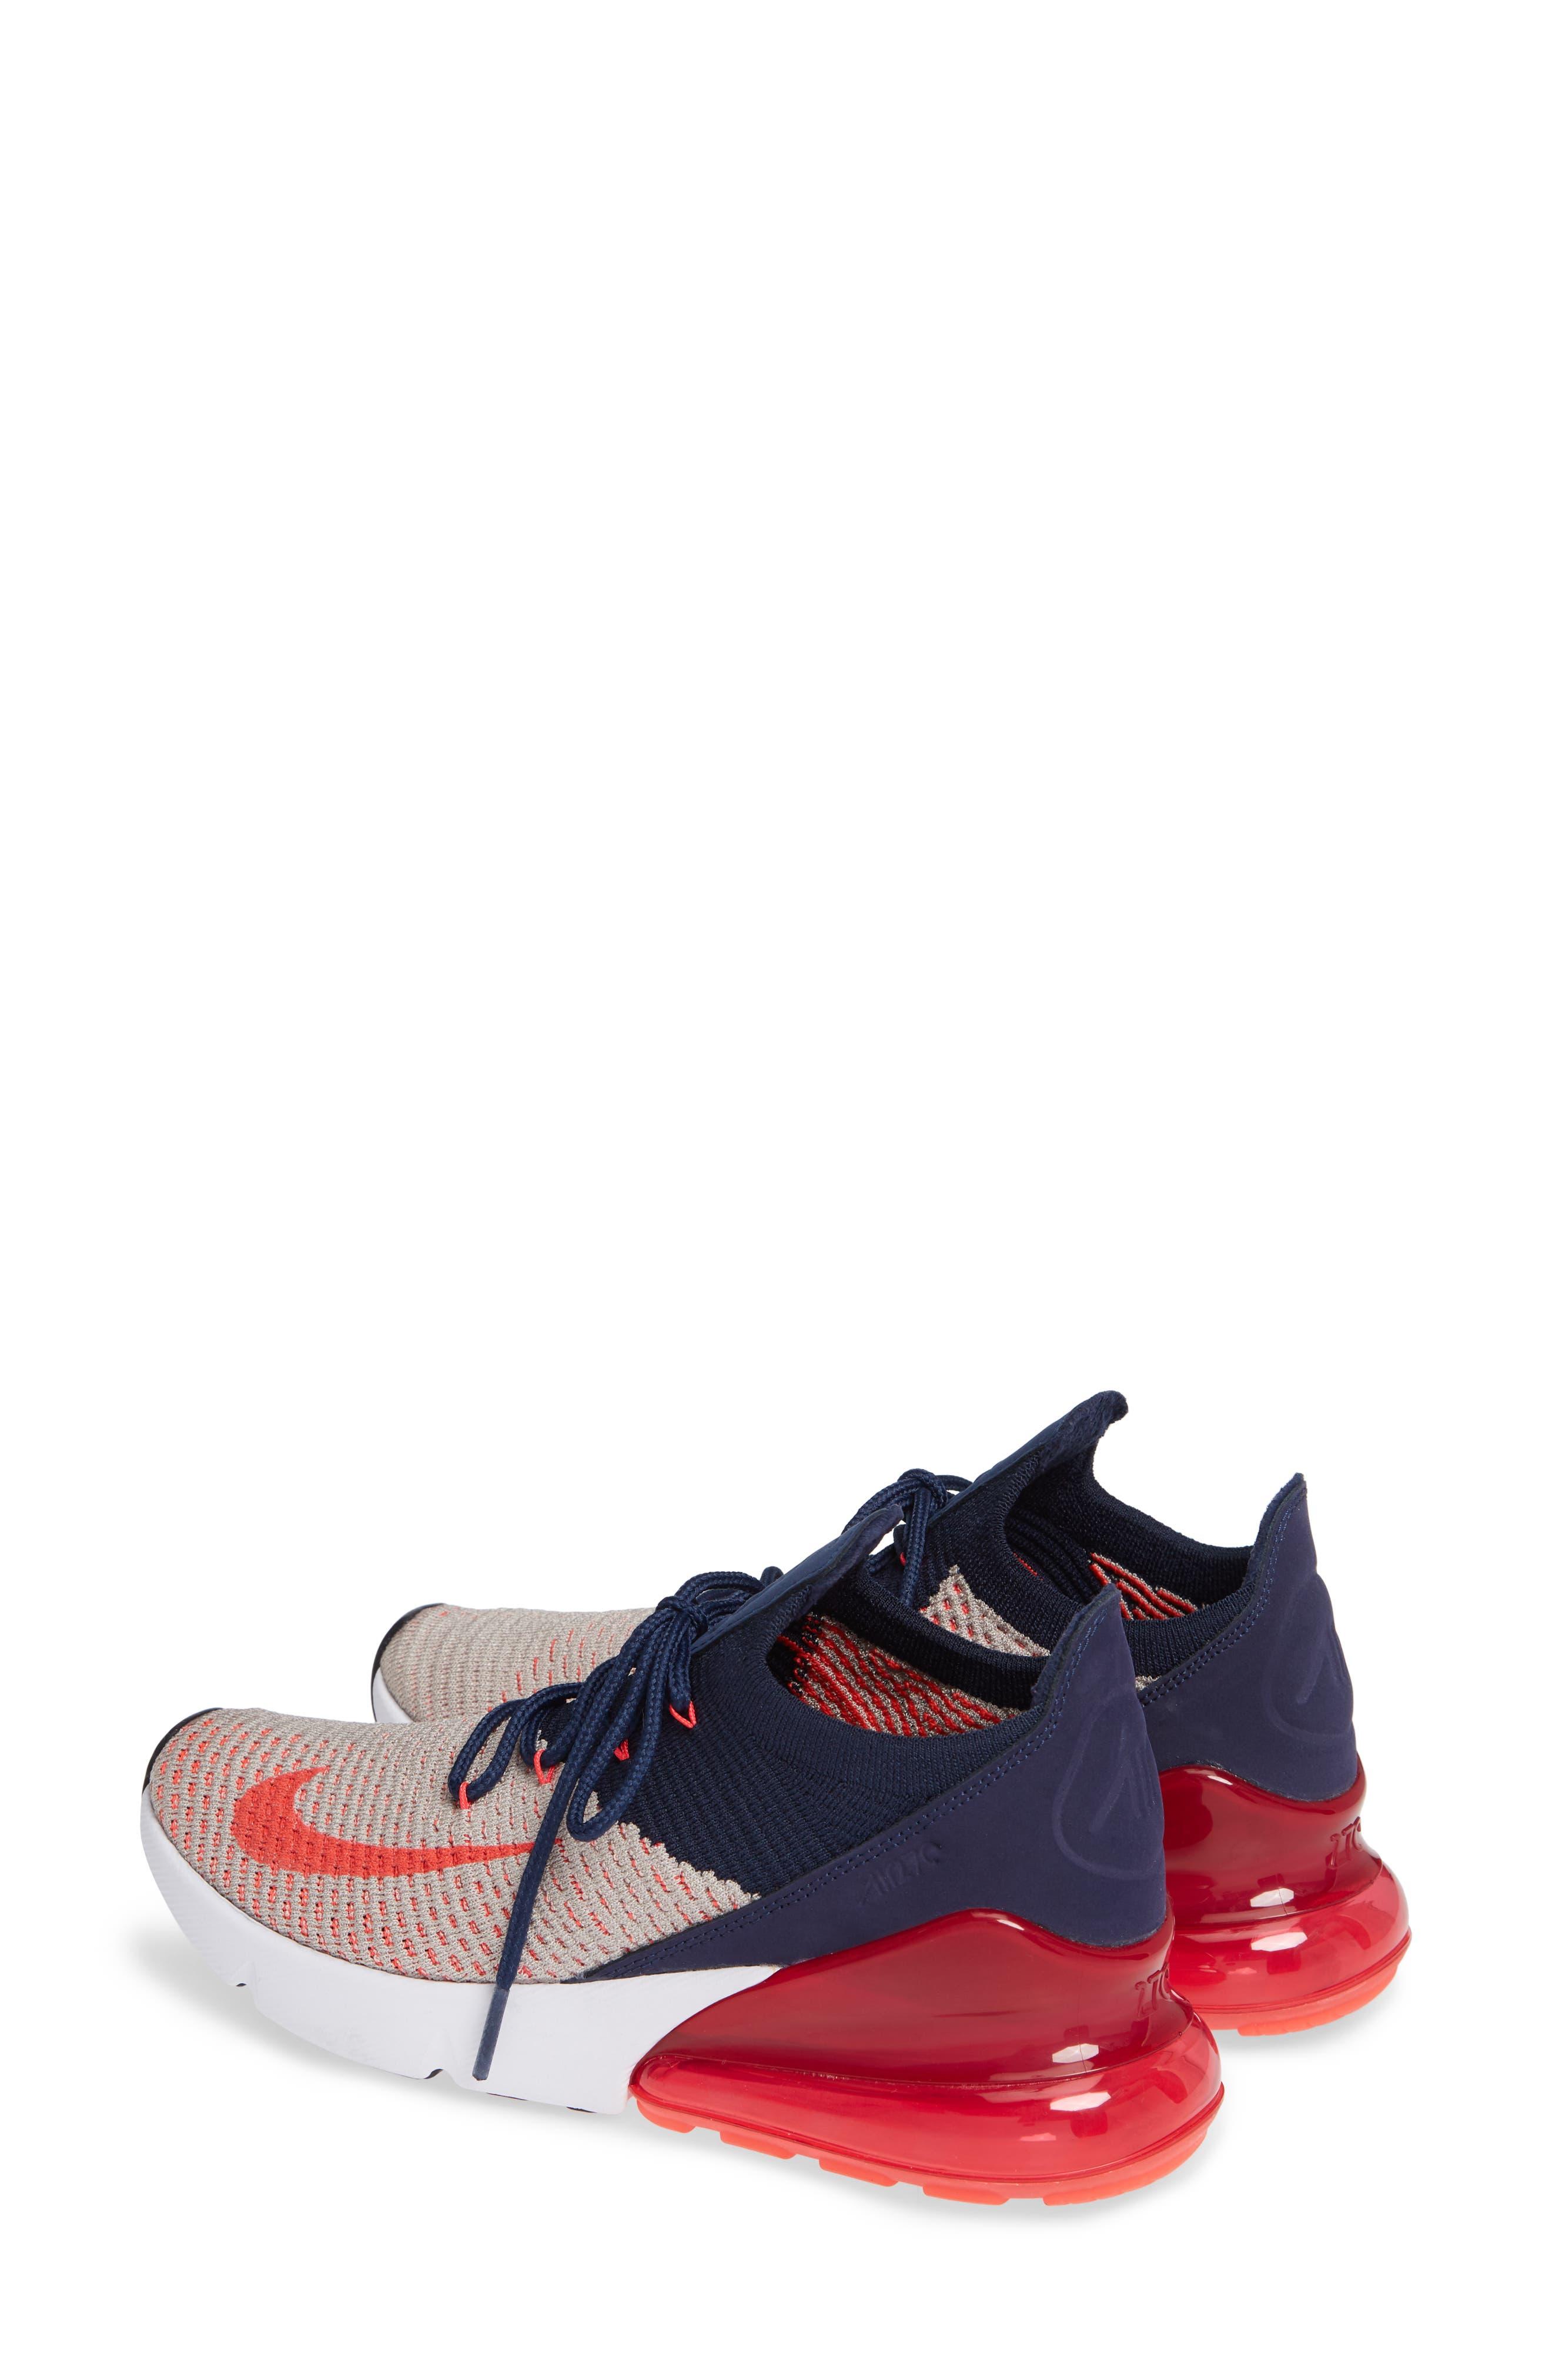 Air Max 270 Flyknit Sneaker,                             Alternate thumbnail 19, color,